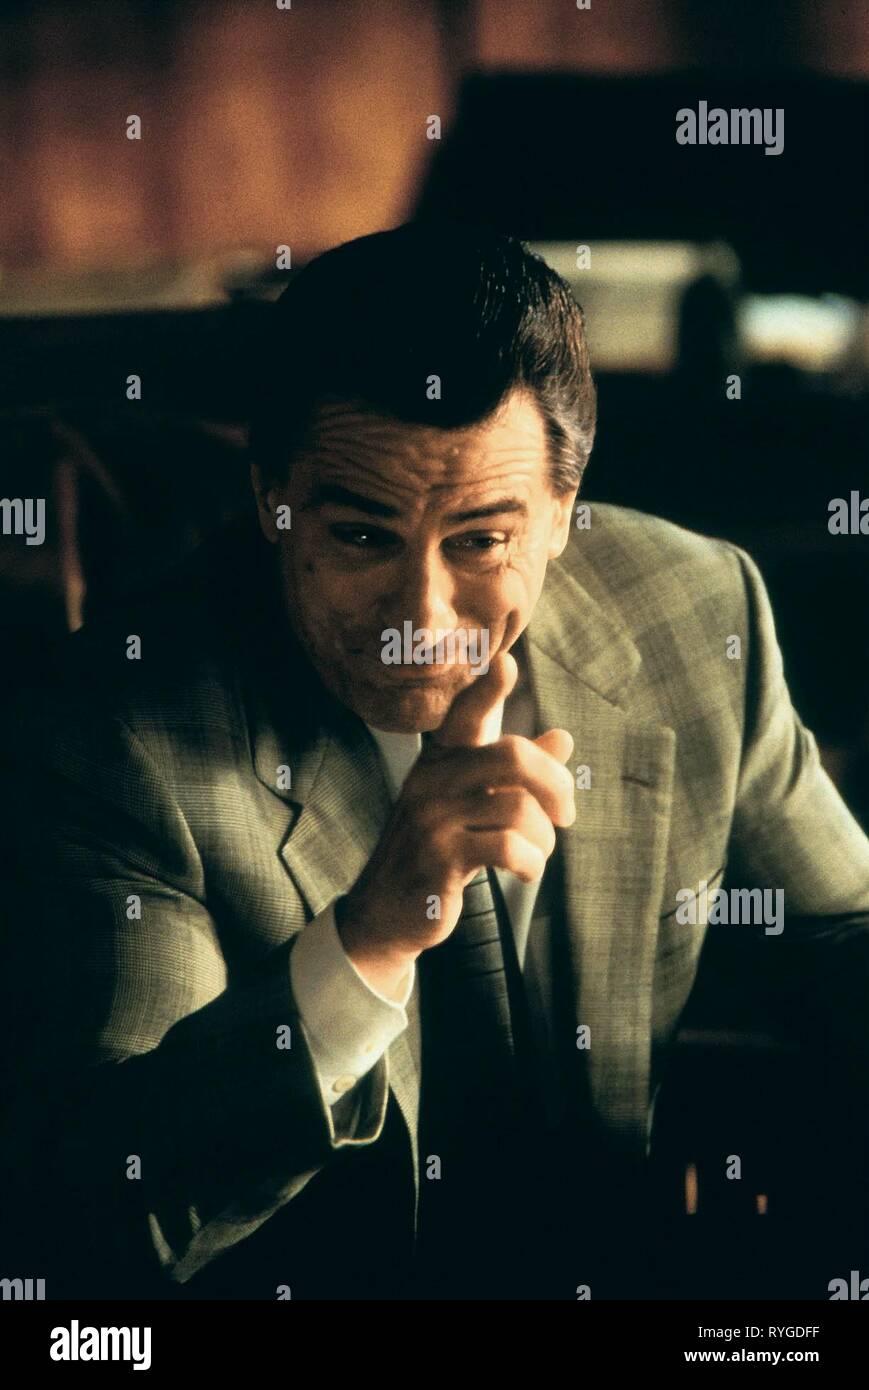 Robert De Niro Analyze This 1999 Stock Photo Alamy